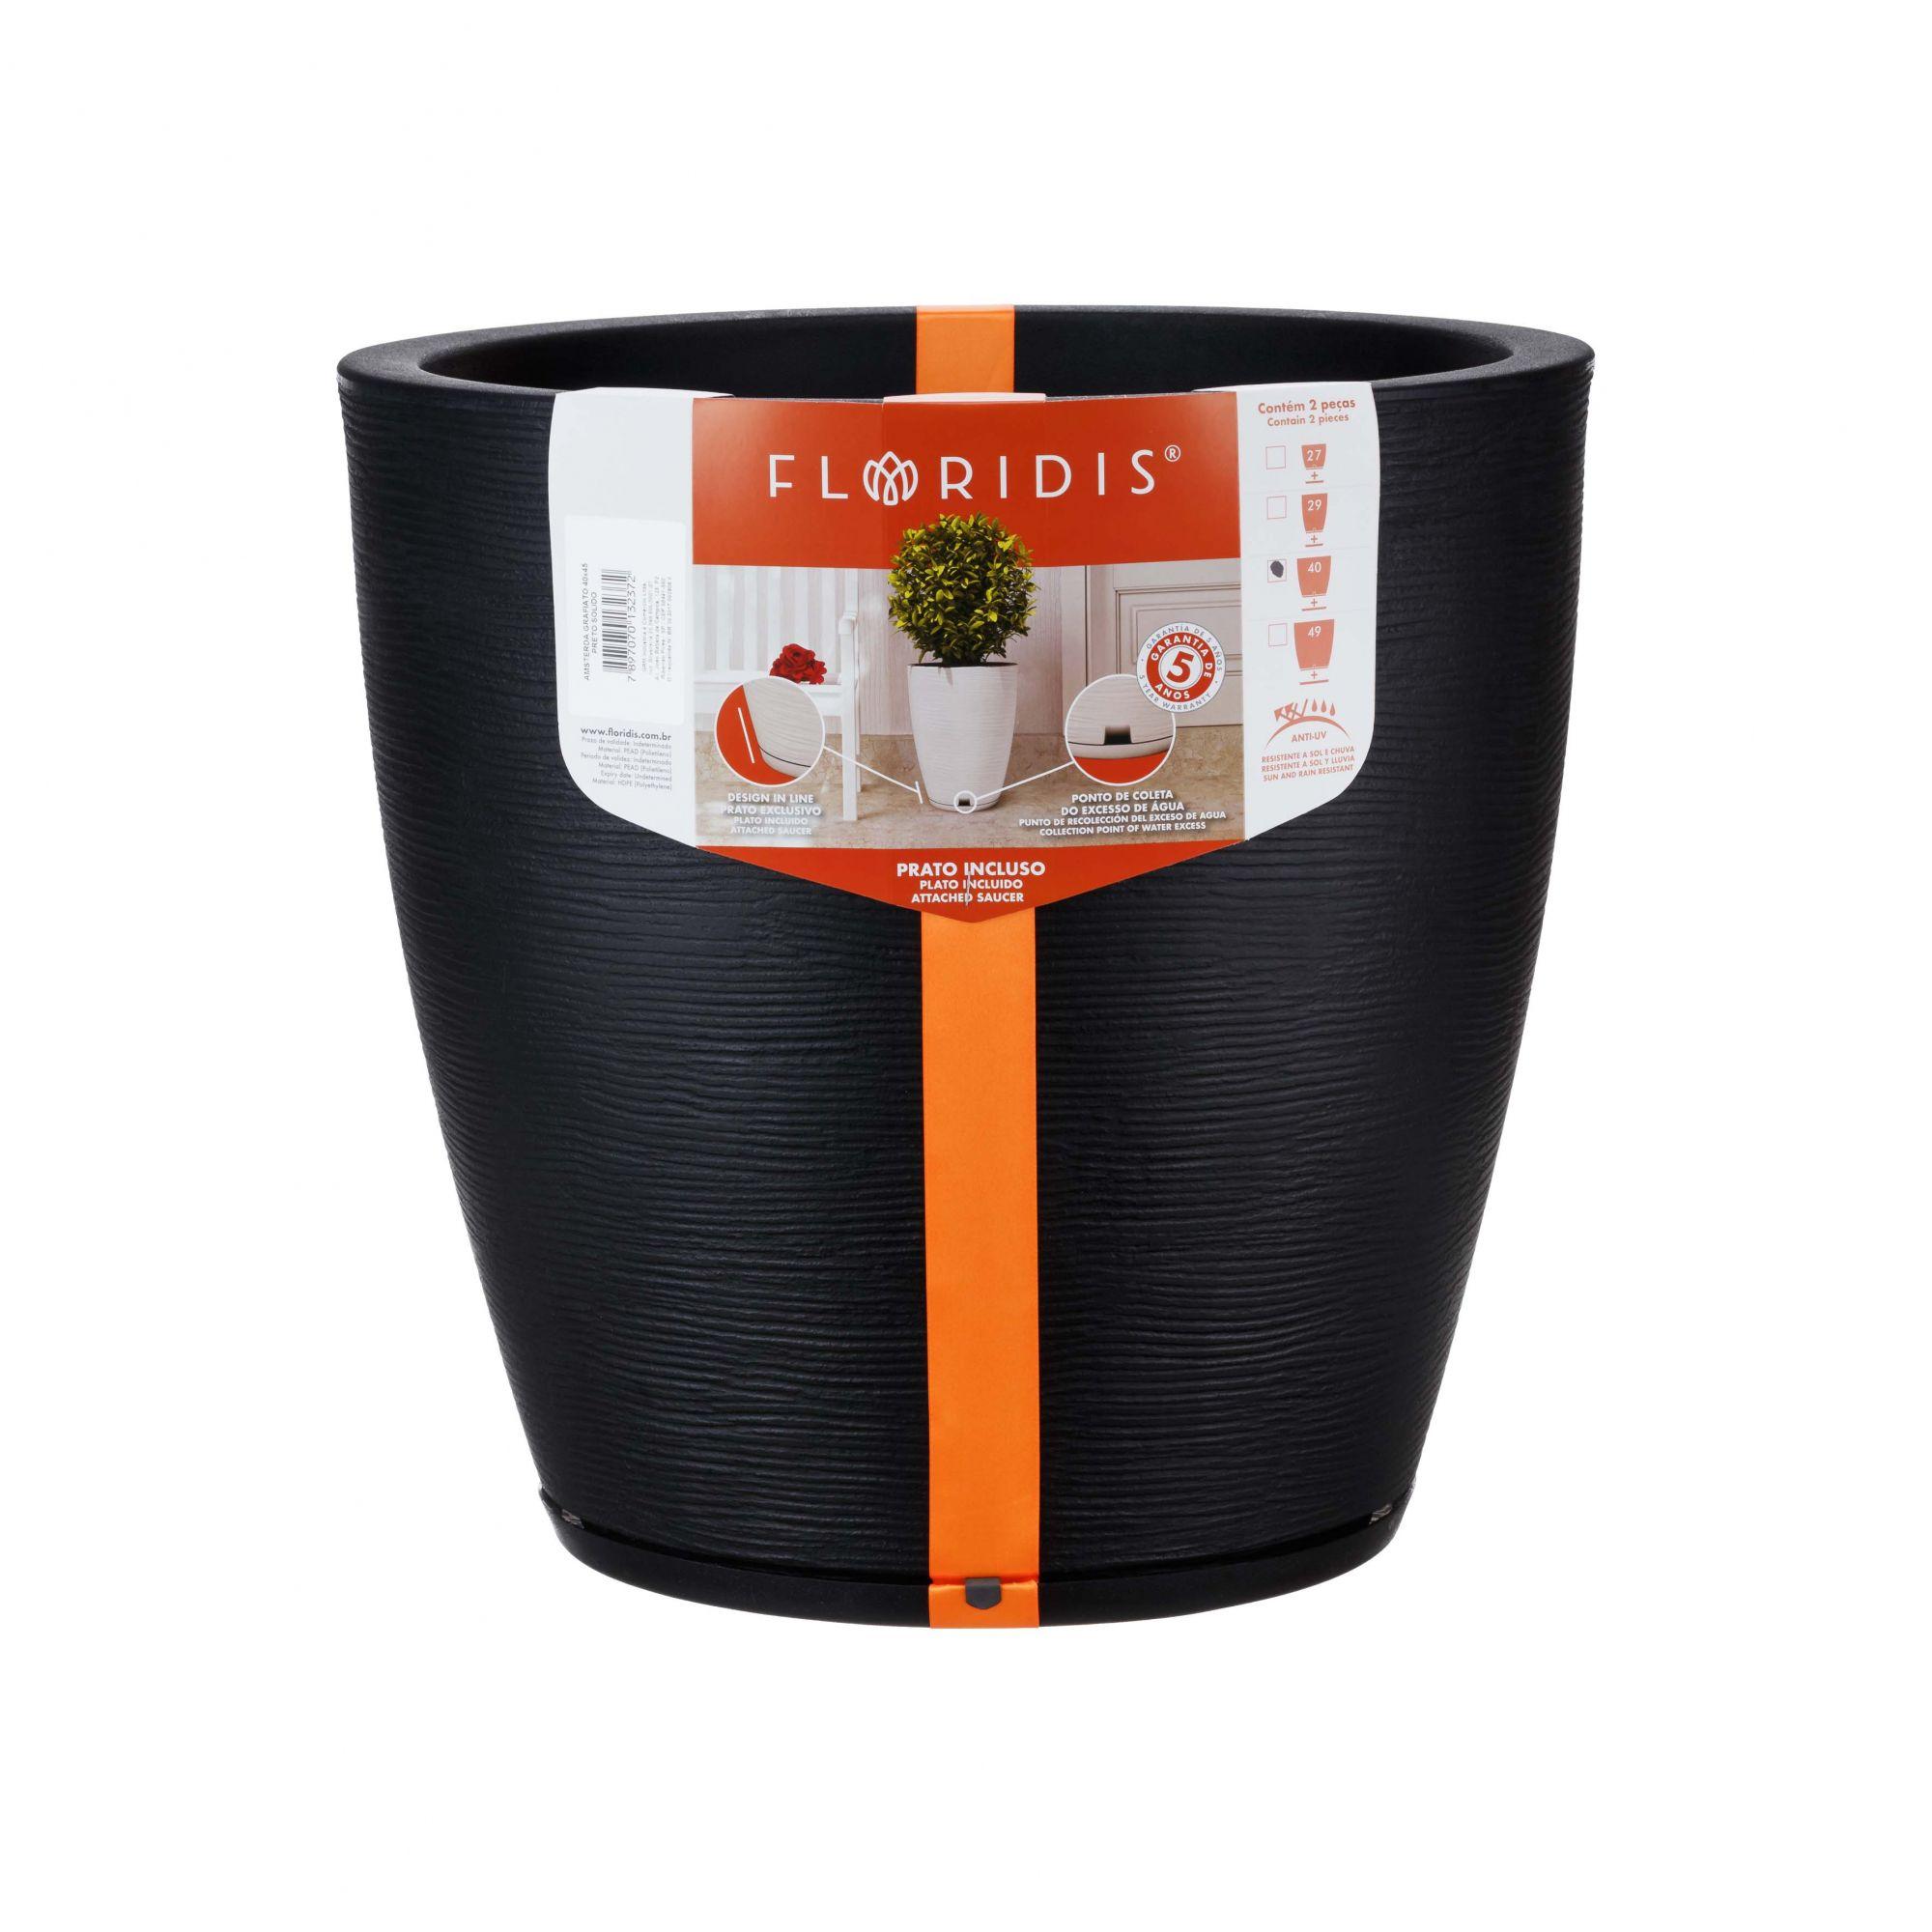 Vaso Amsterdã Grafiato Preto Sólido - 40 x 45 cm